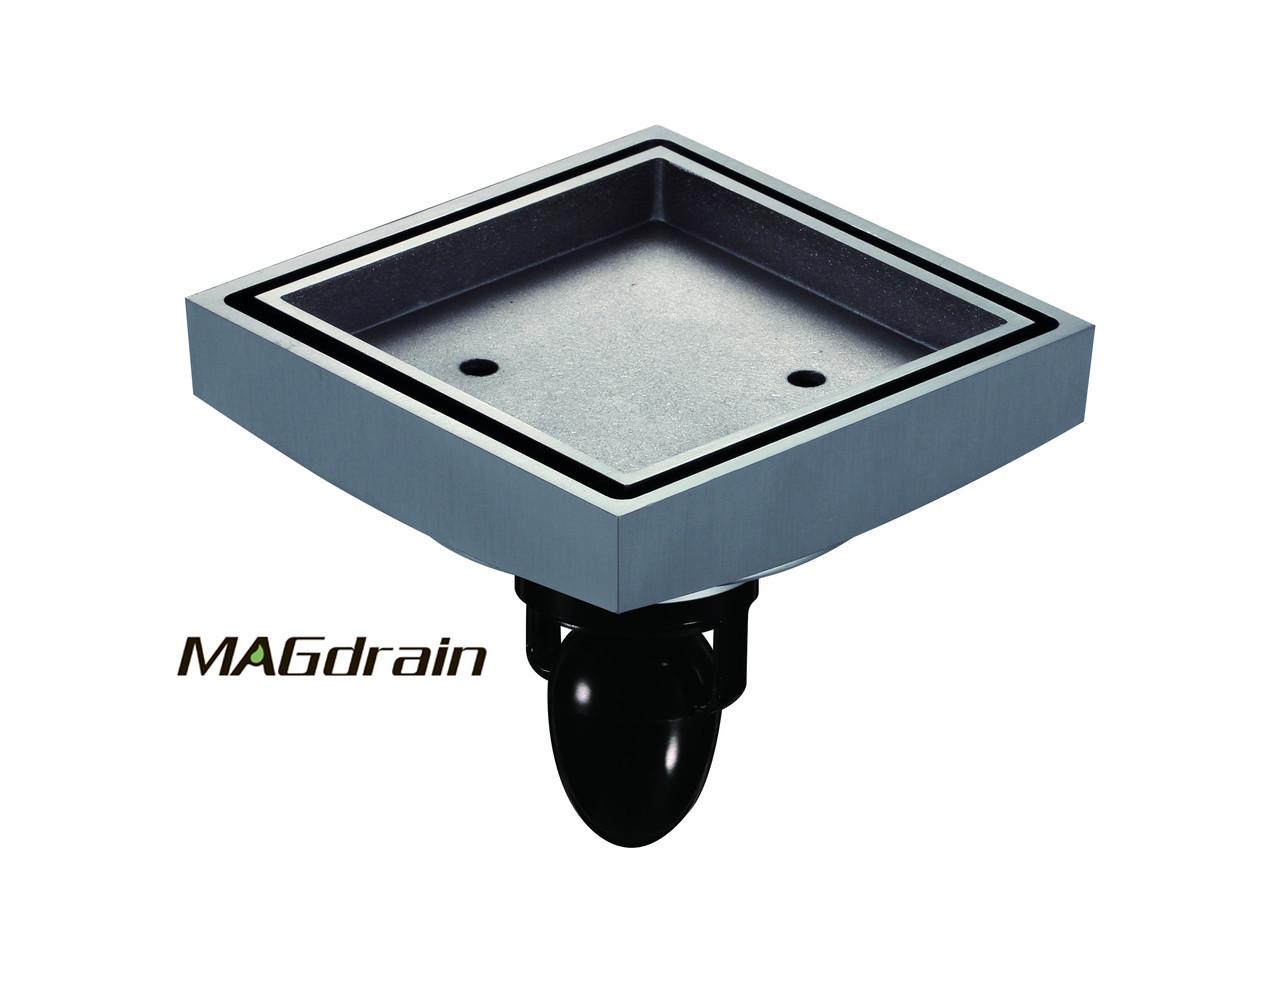 Е2 Трап сливной MAGdrain FC07Q5-G хром под плитку 100х100 мм Н-90